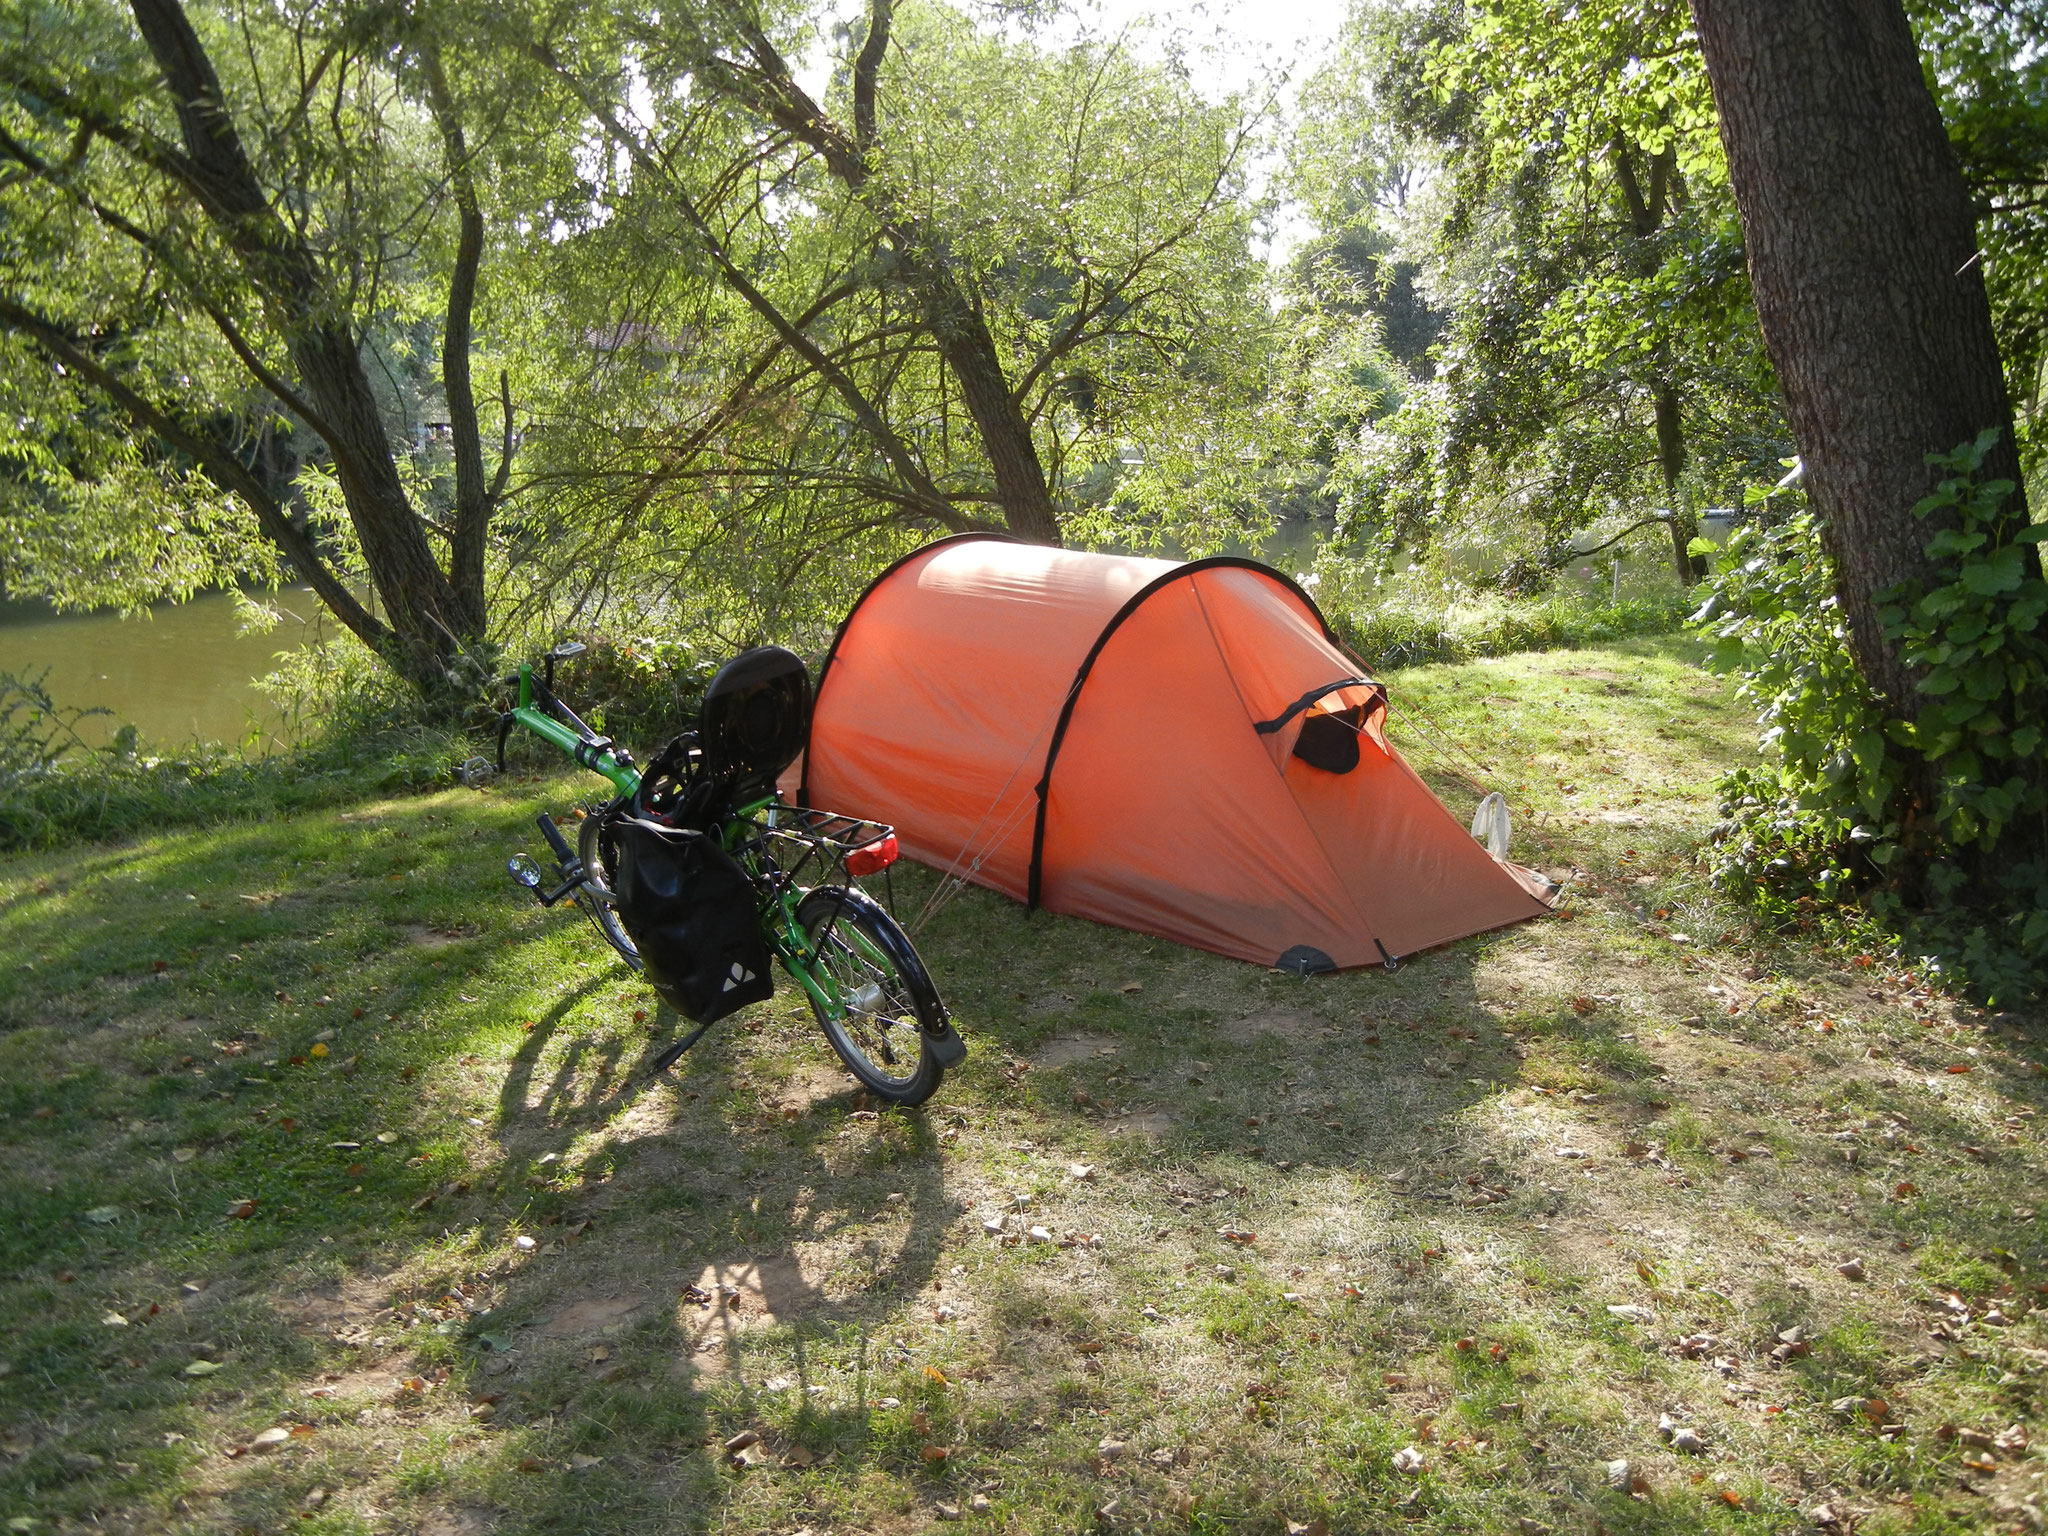 Camping in Rotenburg